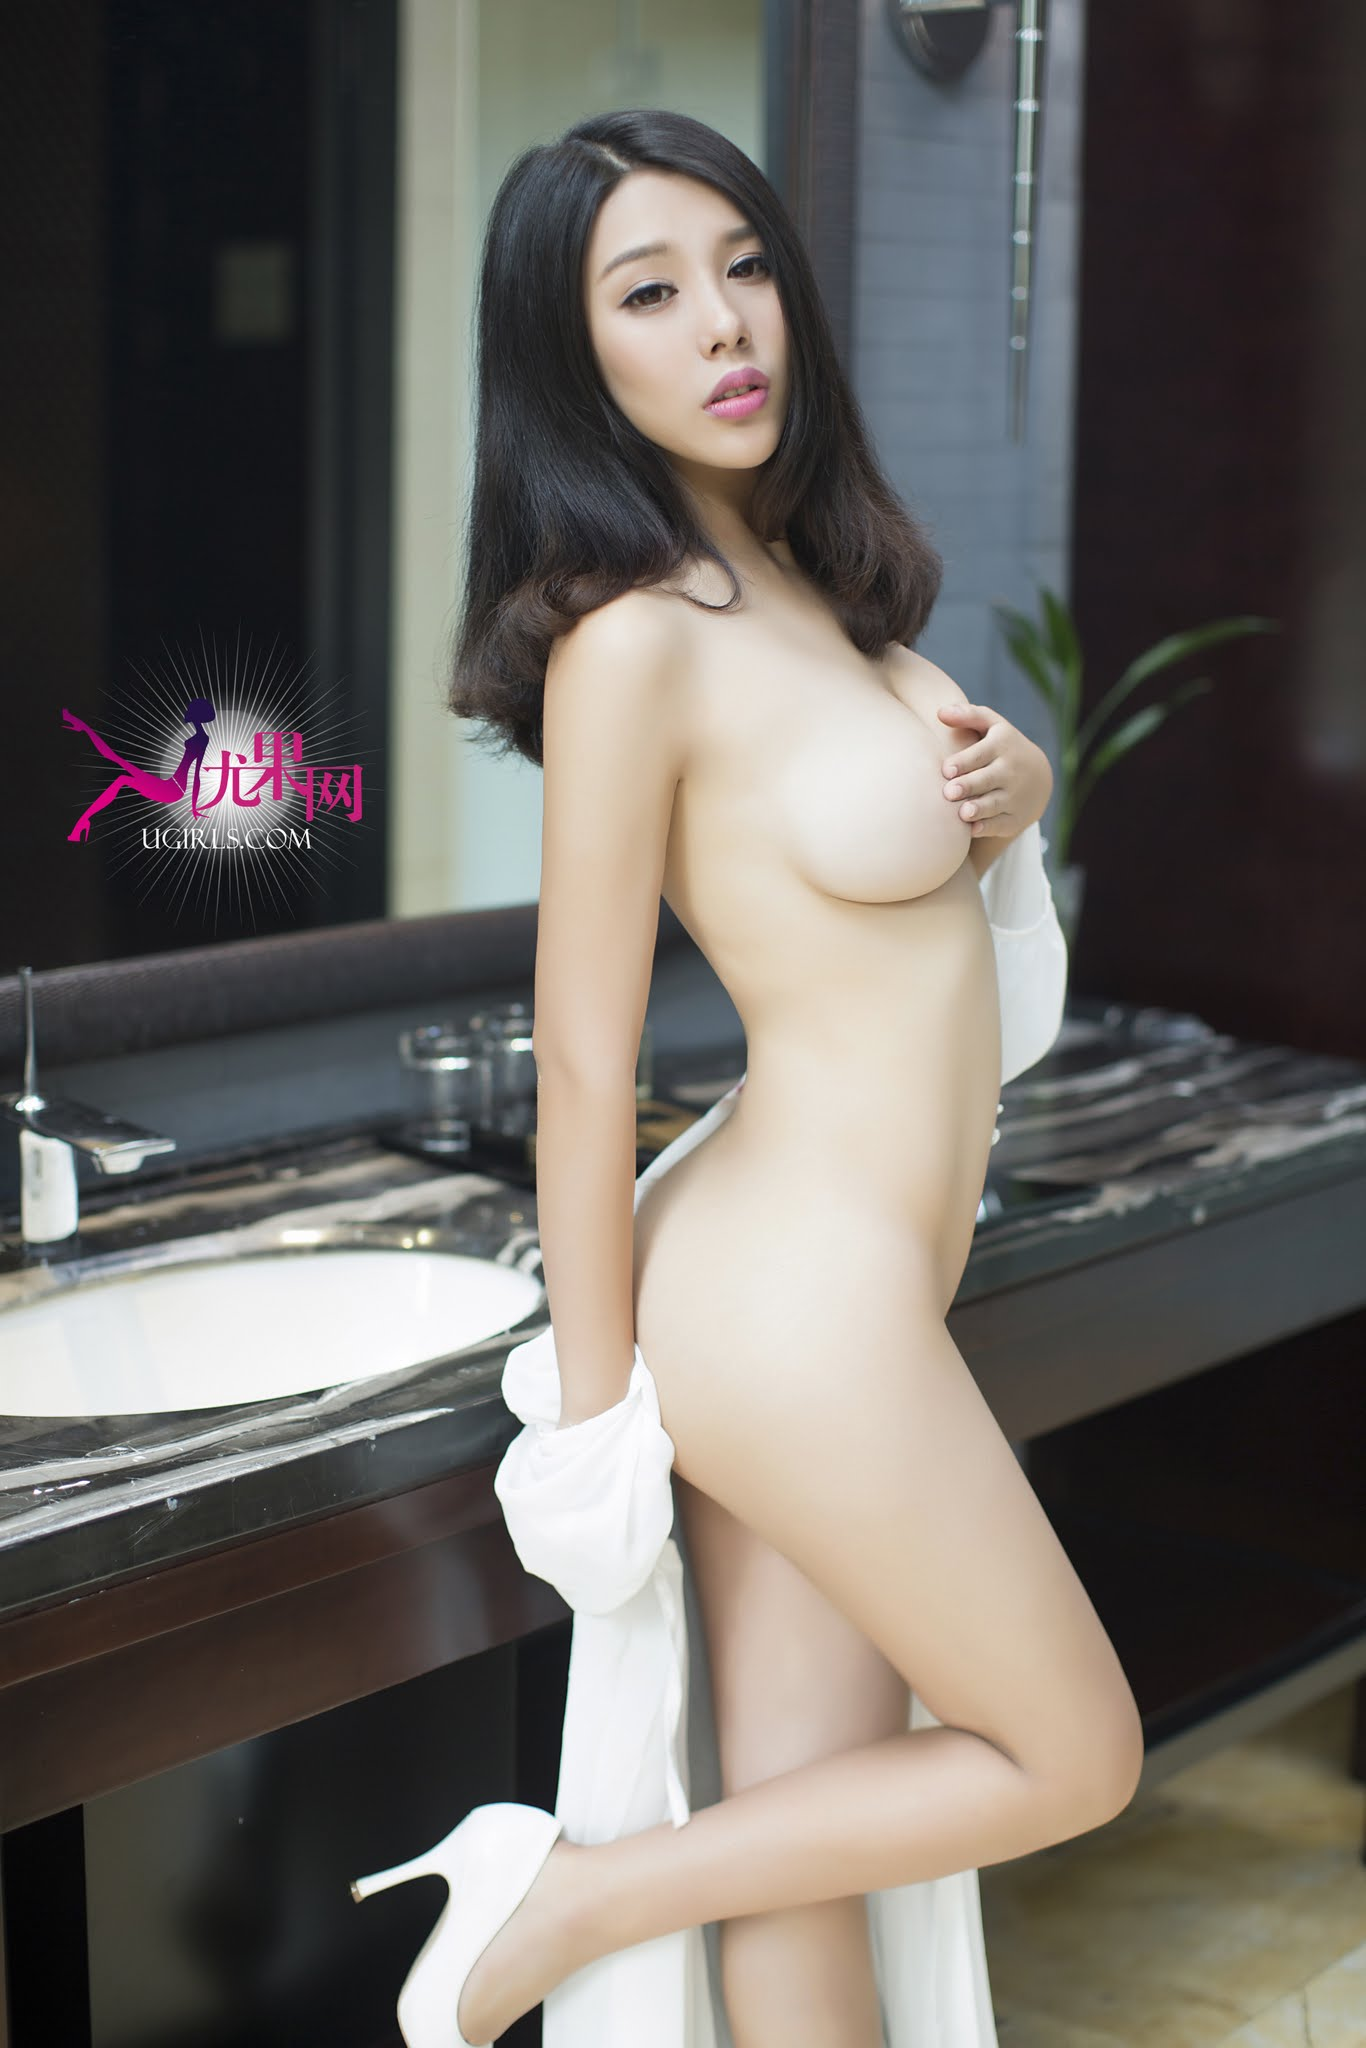 Hot hong kong girl doggy herself - 3 4